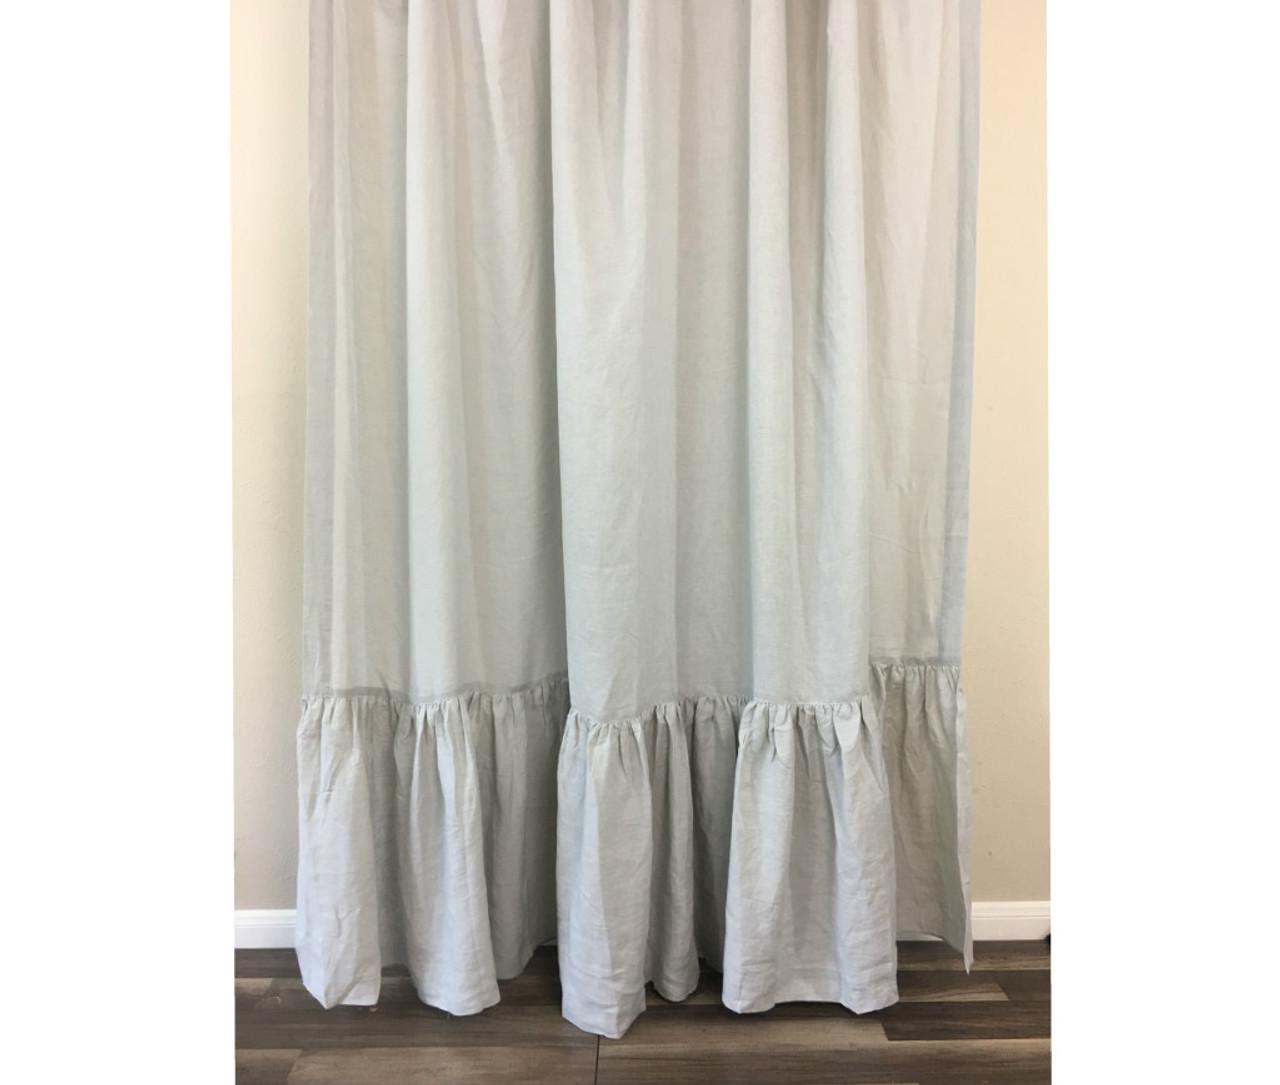 grey linen shower curtain. Stone Grey Linen Shower Curtain with Mermaid Long Ruffles